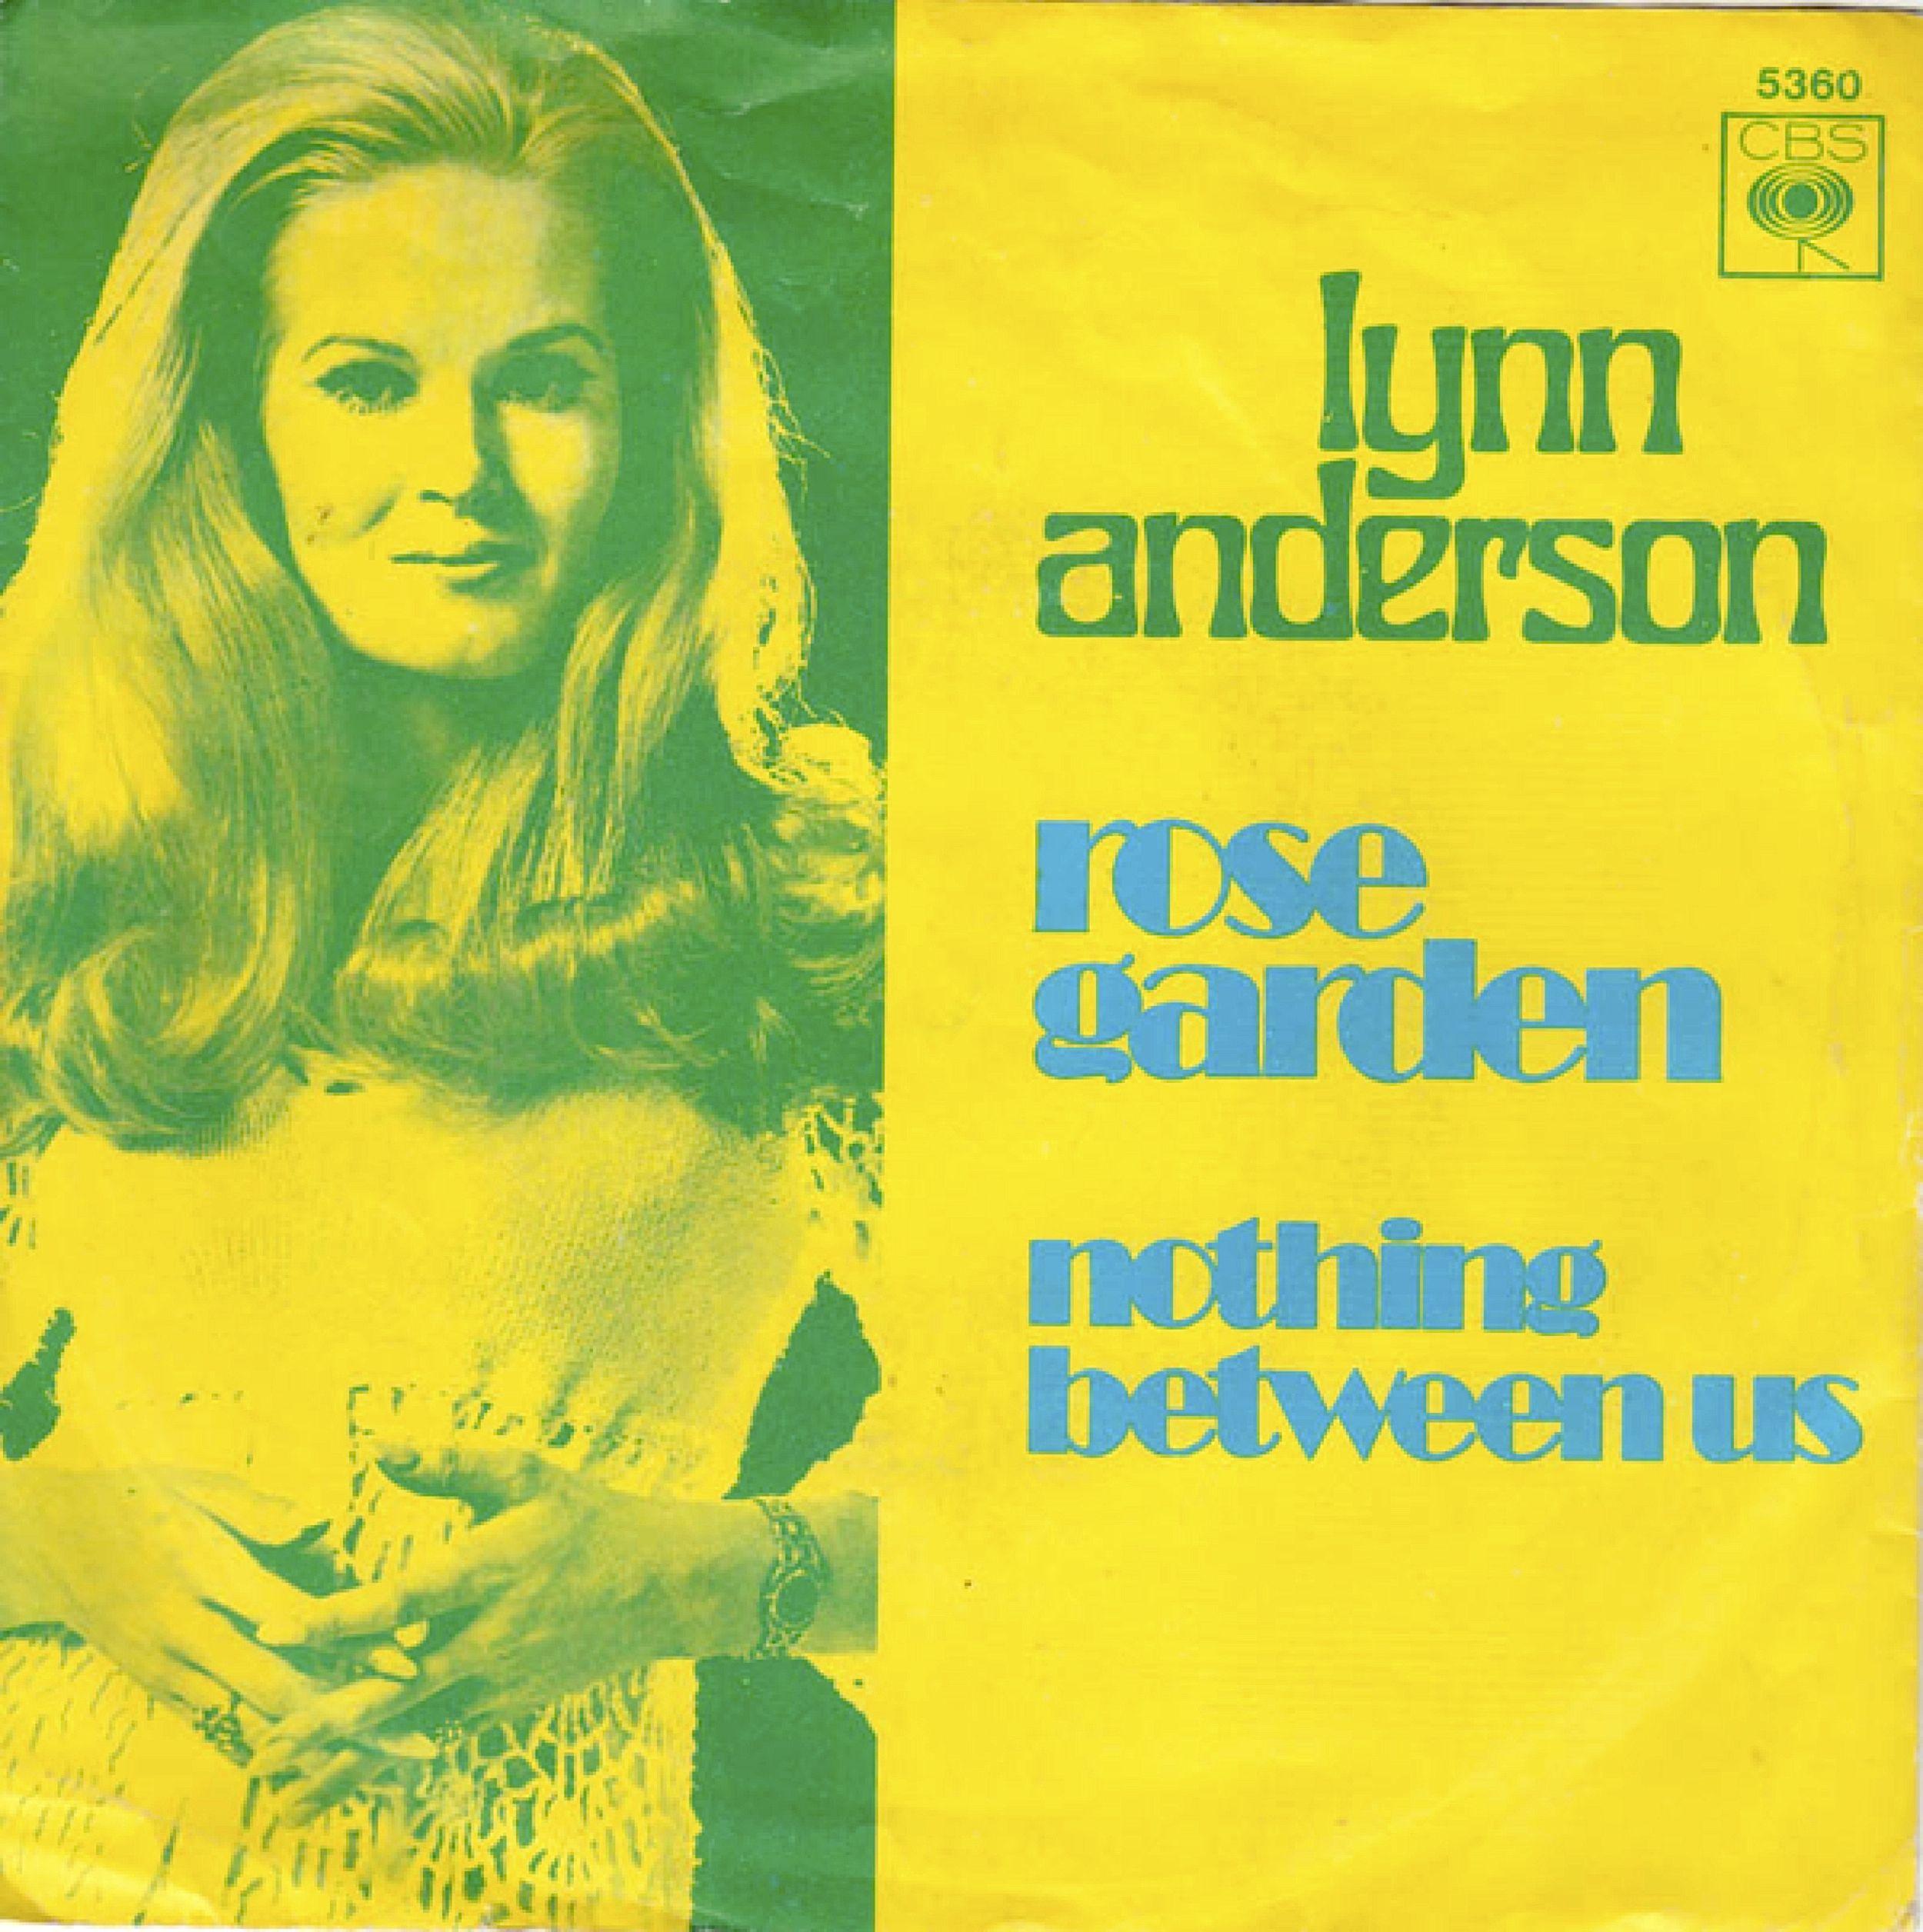 SINGLE VAN DE WEEK LYNN ANDERSON ROSE GARDEN